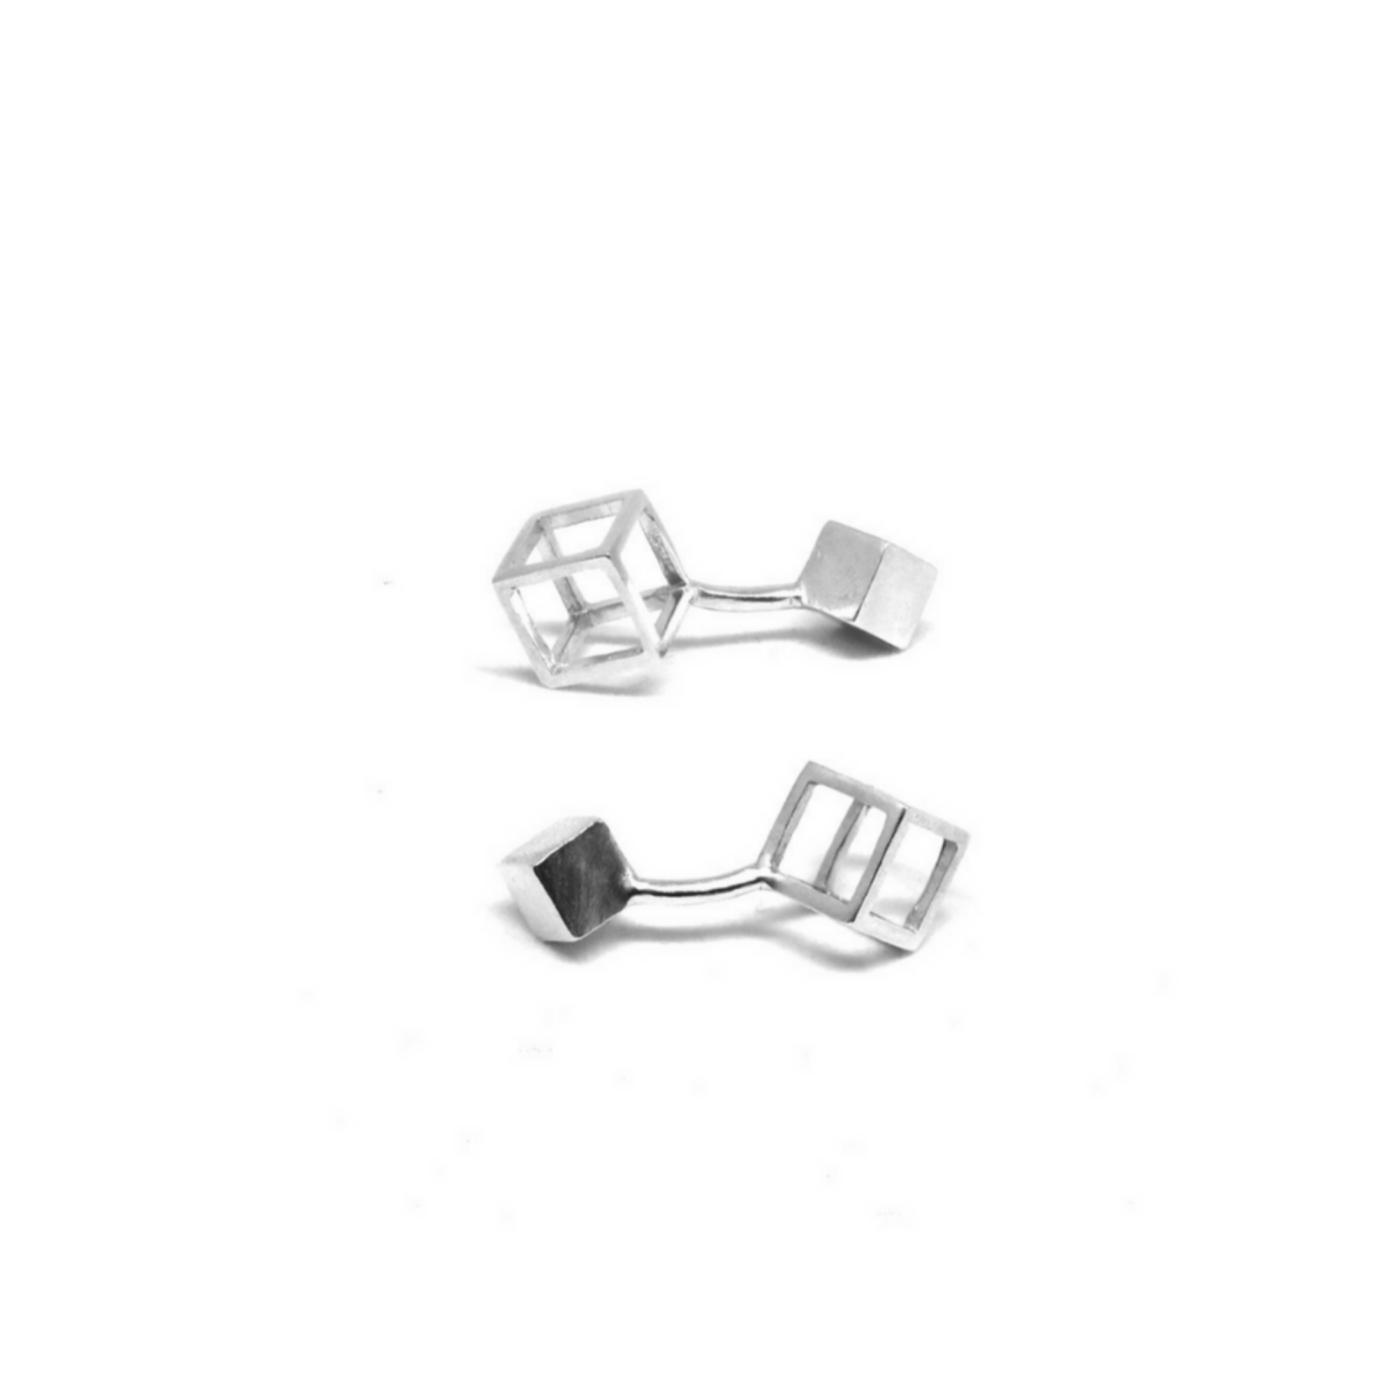 Q.Bo. Cuff Links 925 Silver Sterling